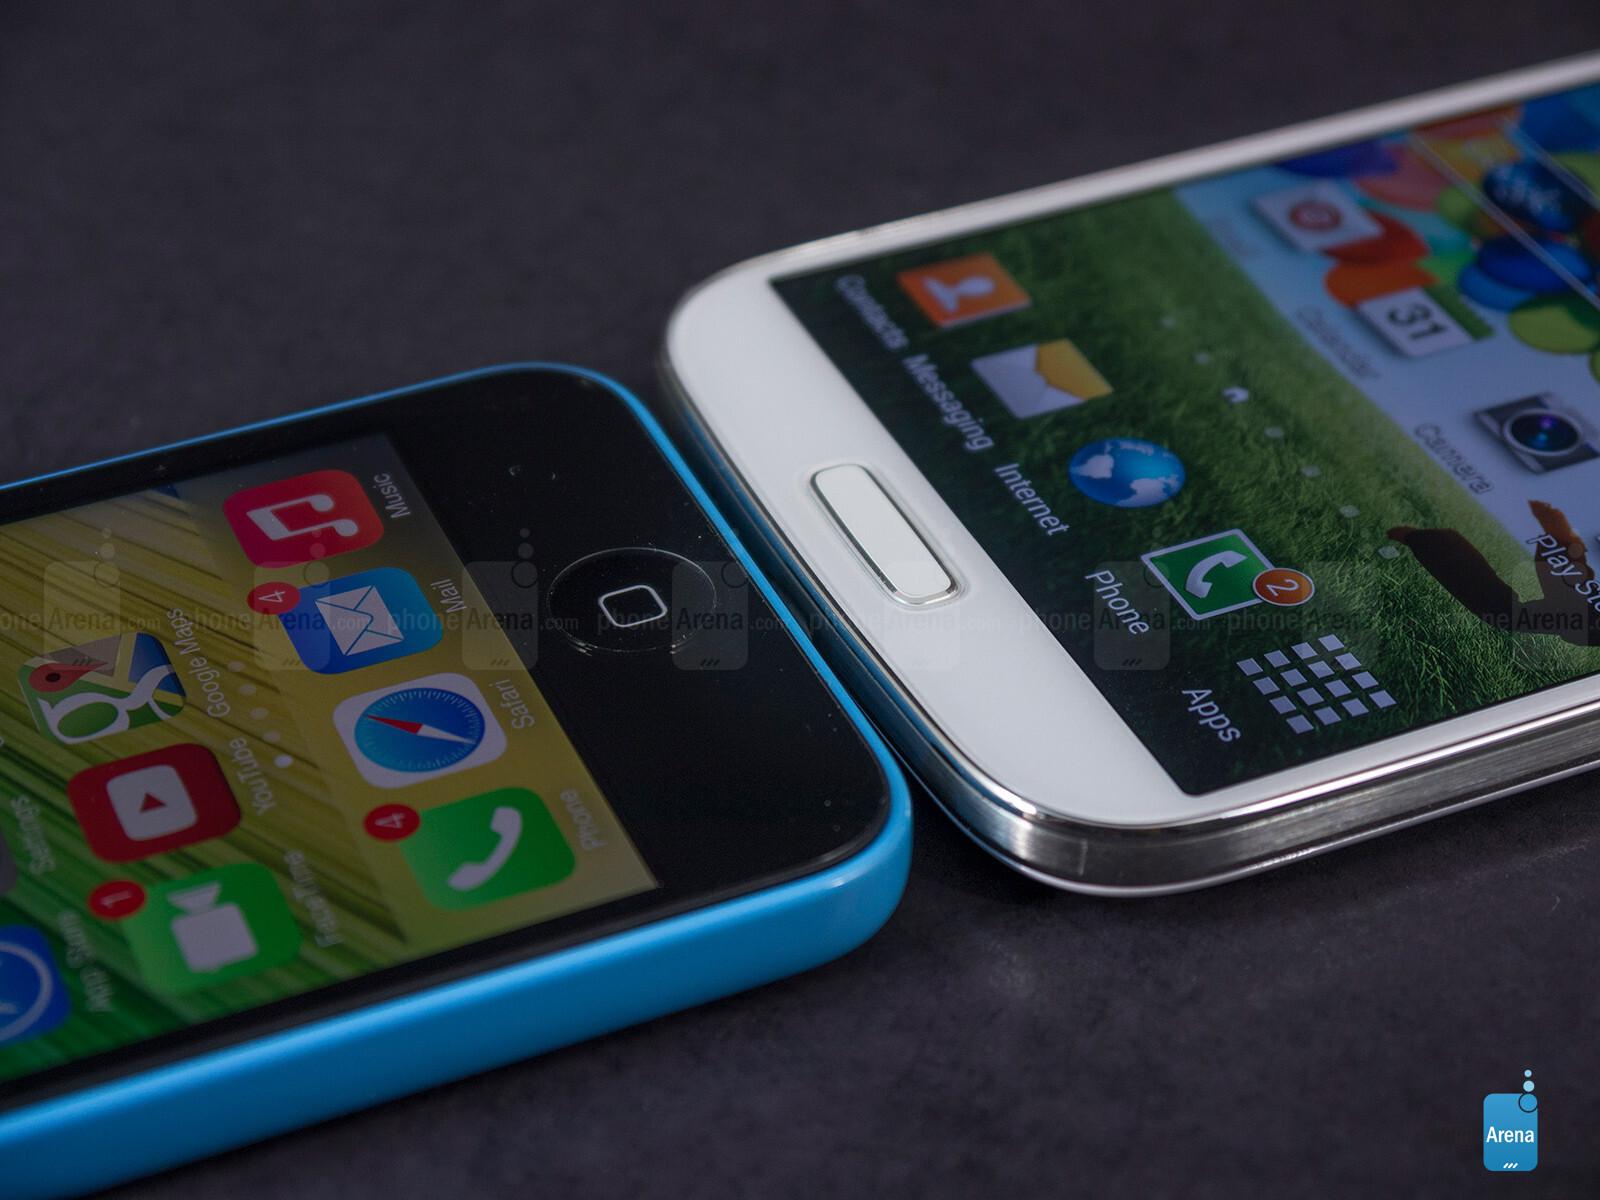 galaxy s4 battery life vs iphone 5